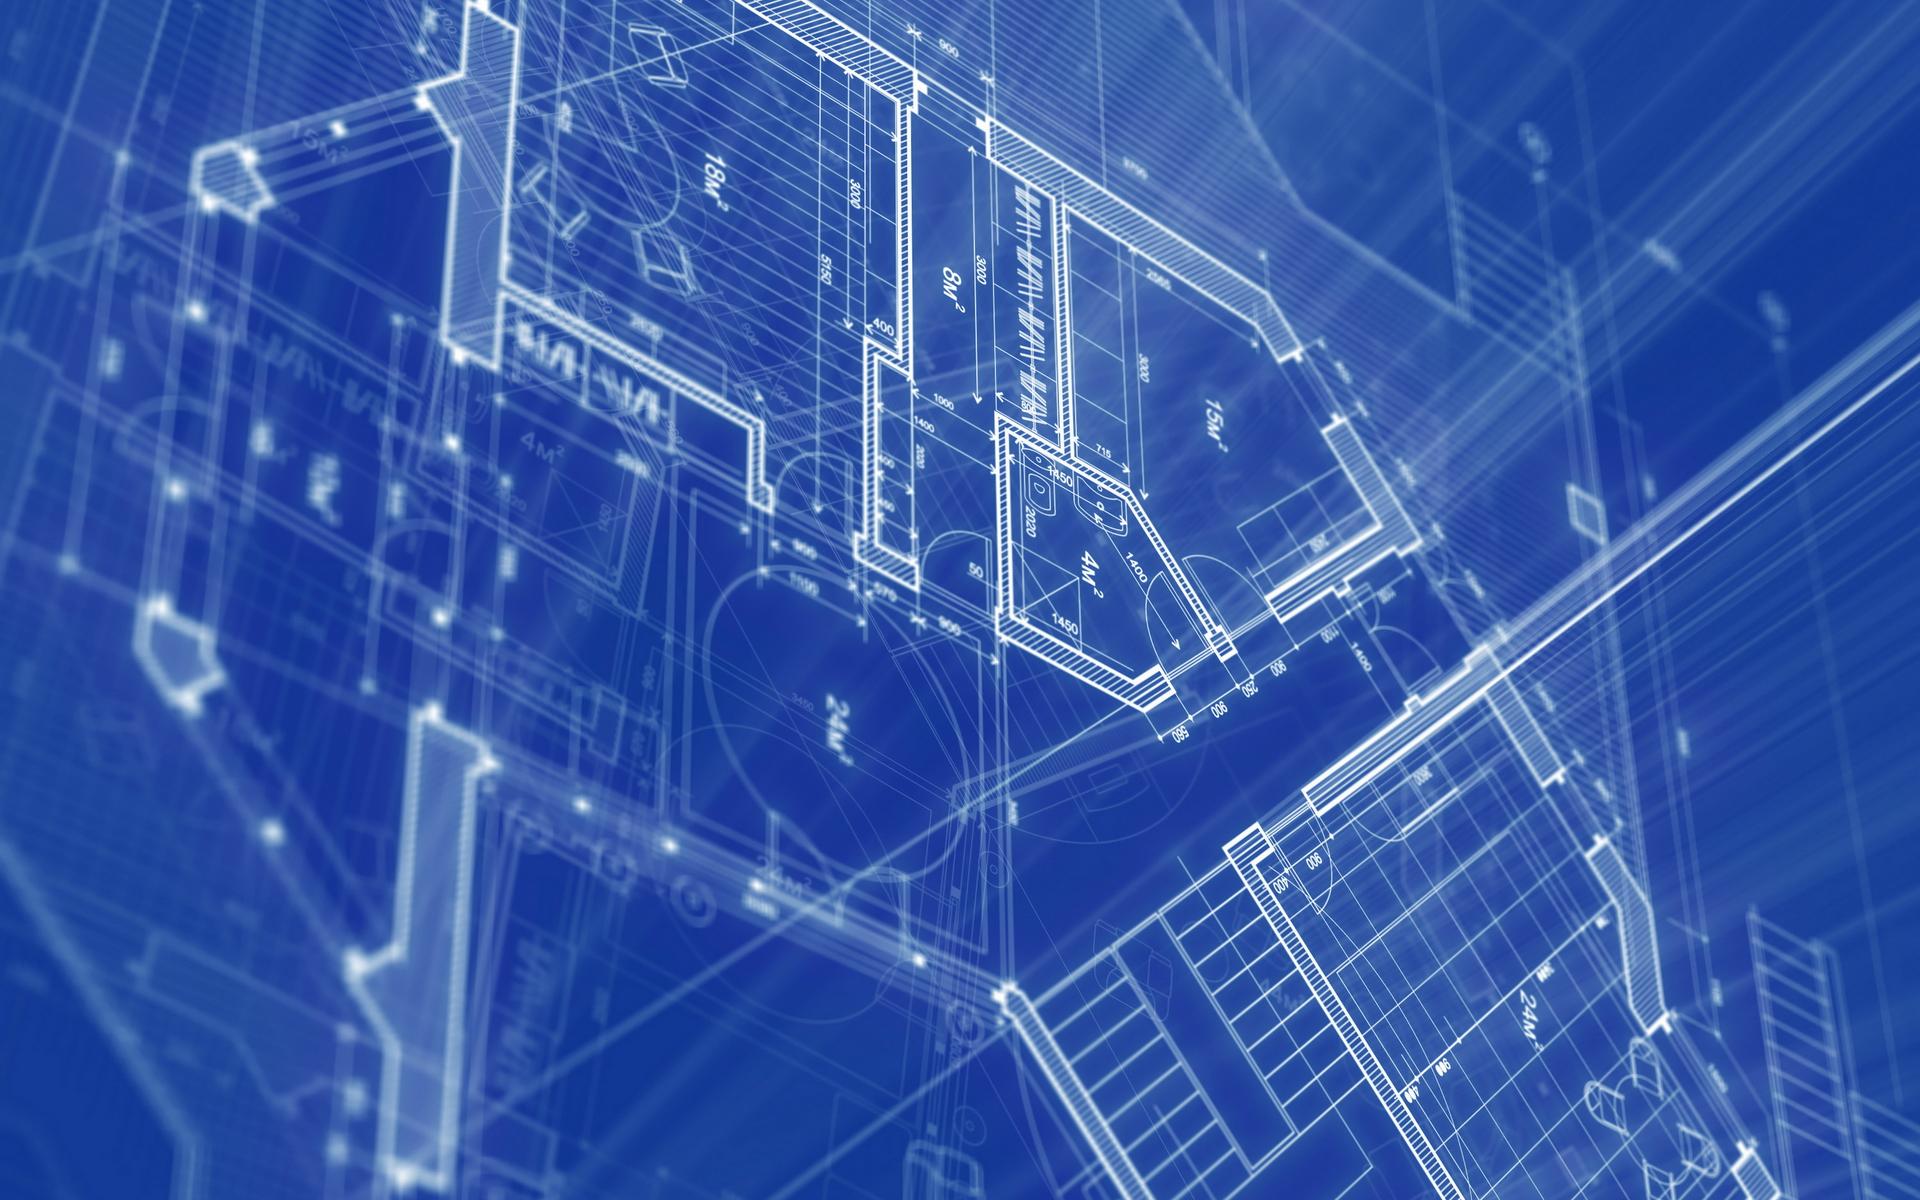 Flowchart Project Engineering Management Installation